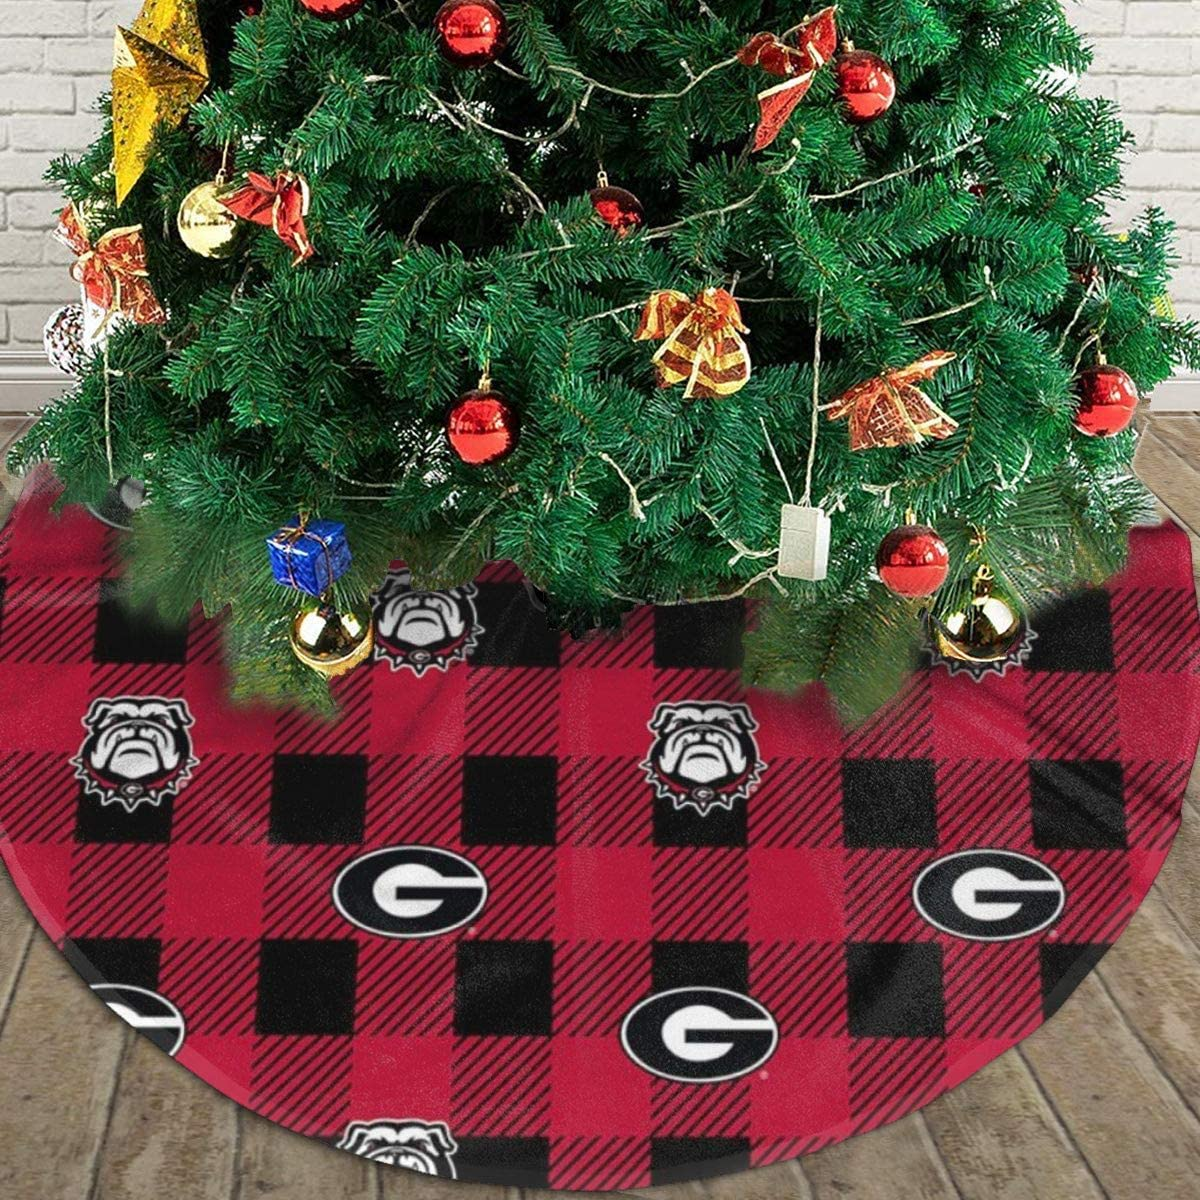 NYF Christmas Tree Skirt Georgia Bulldog Check Tree Skirt Christmas Decoration Handicraft for Xmas Holiday Party